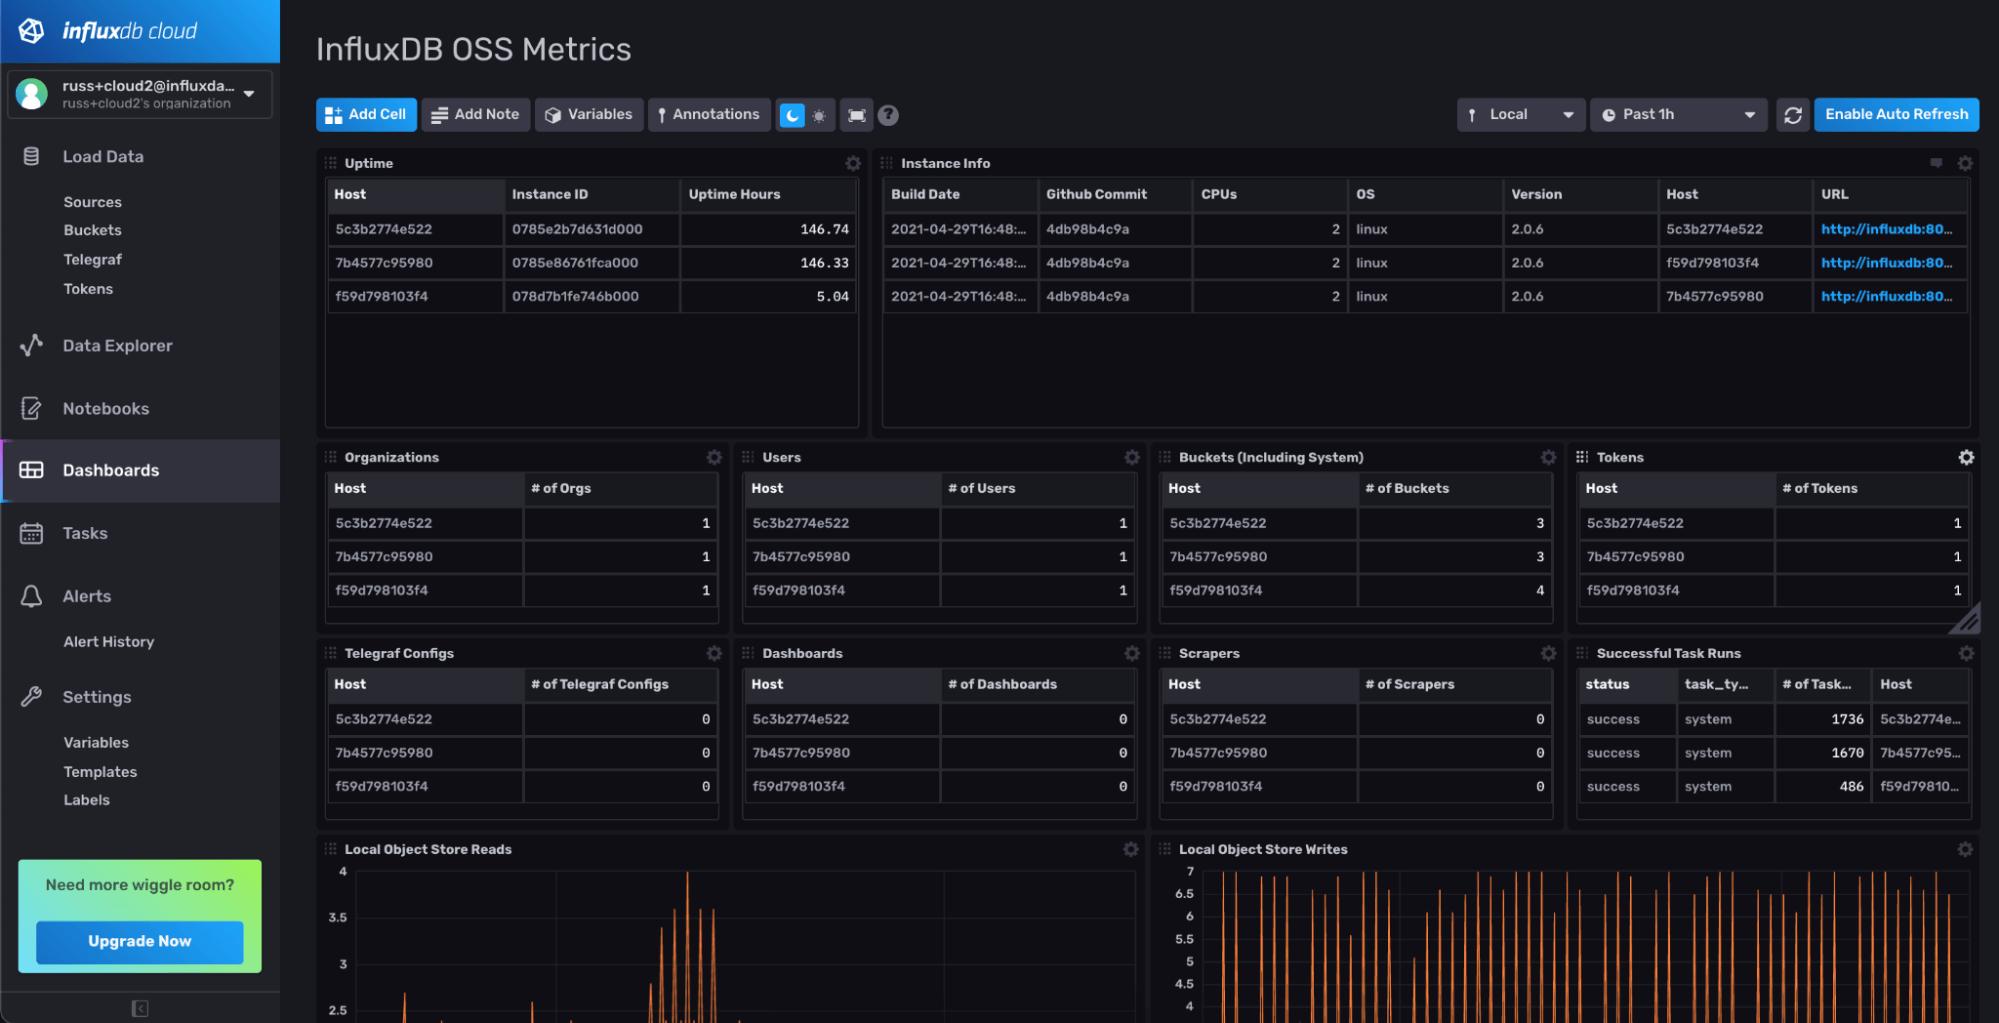 InfluxDB OSS Metrics Dashboard